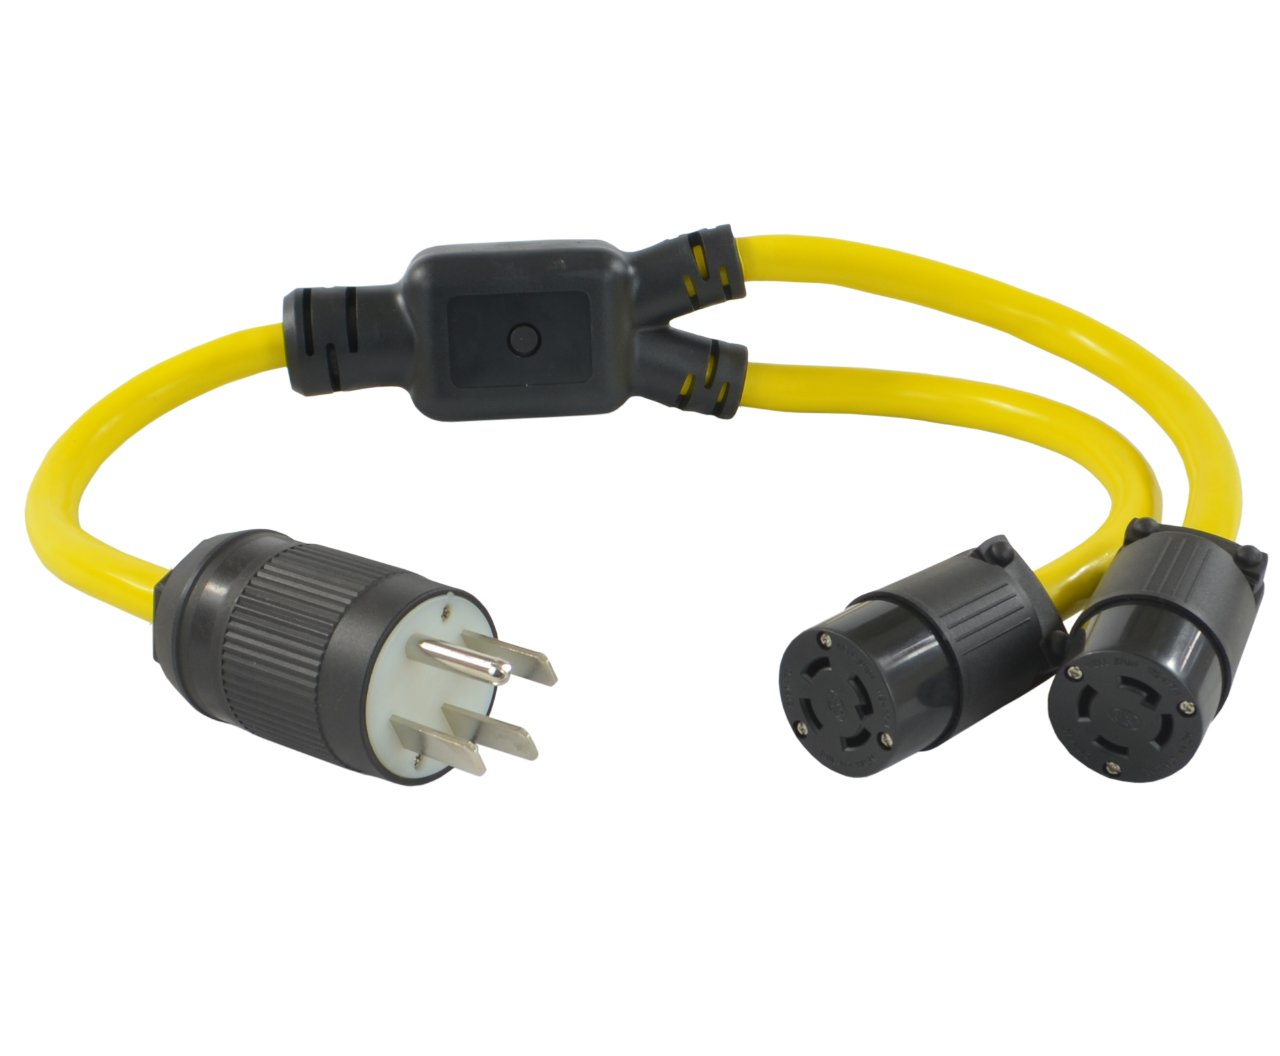 Conntek Y1450L1430 Y Cable NEMA 14-50P RV/Generator/Range Plug to Locking 4 Prong L14-30R Female Adapter